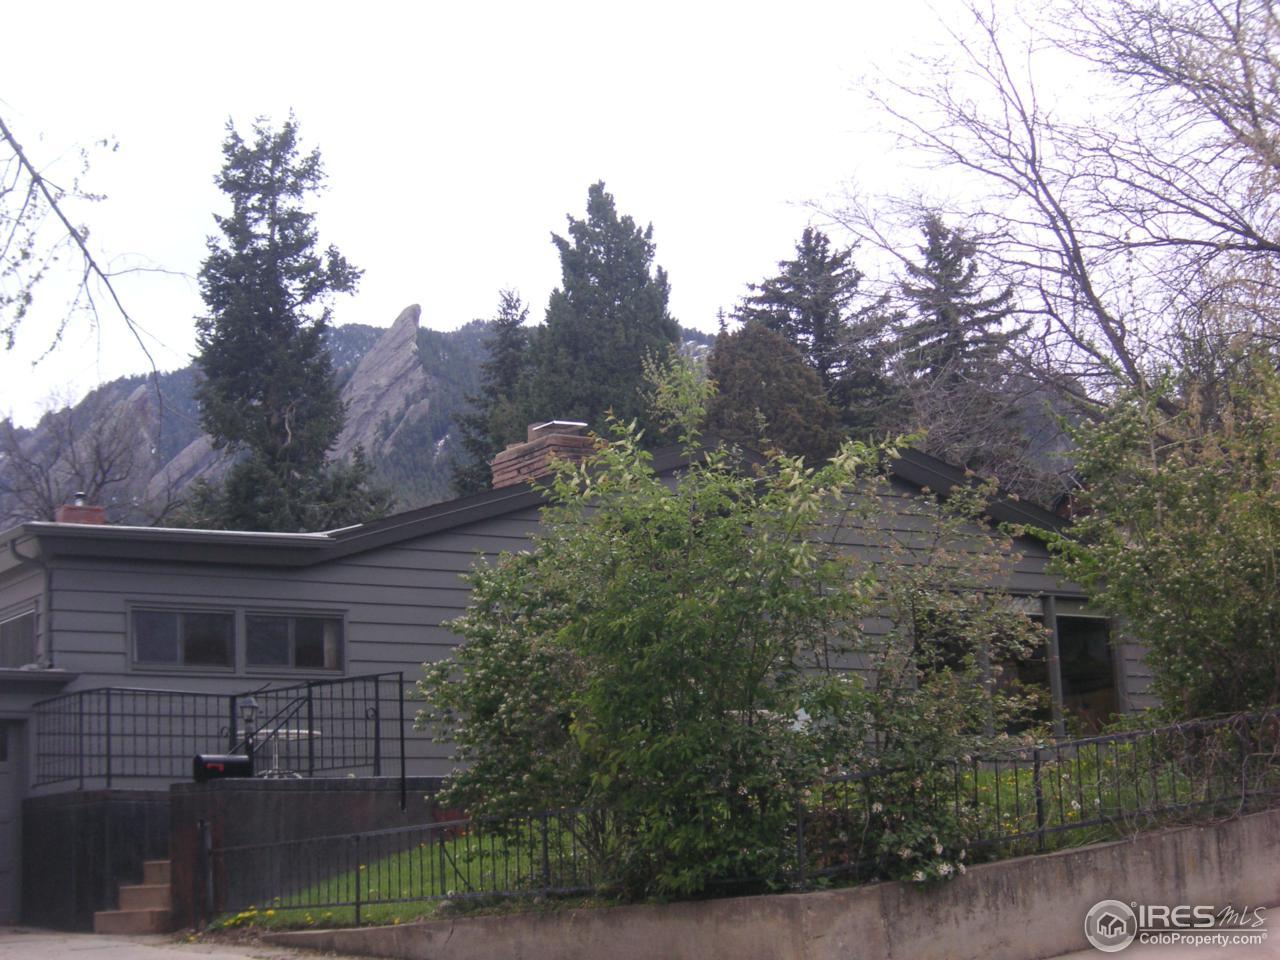 804 Euclid Ave, Boulder, CO 80302